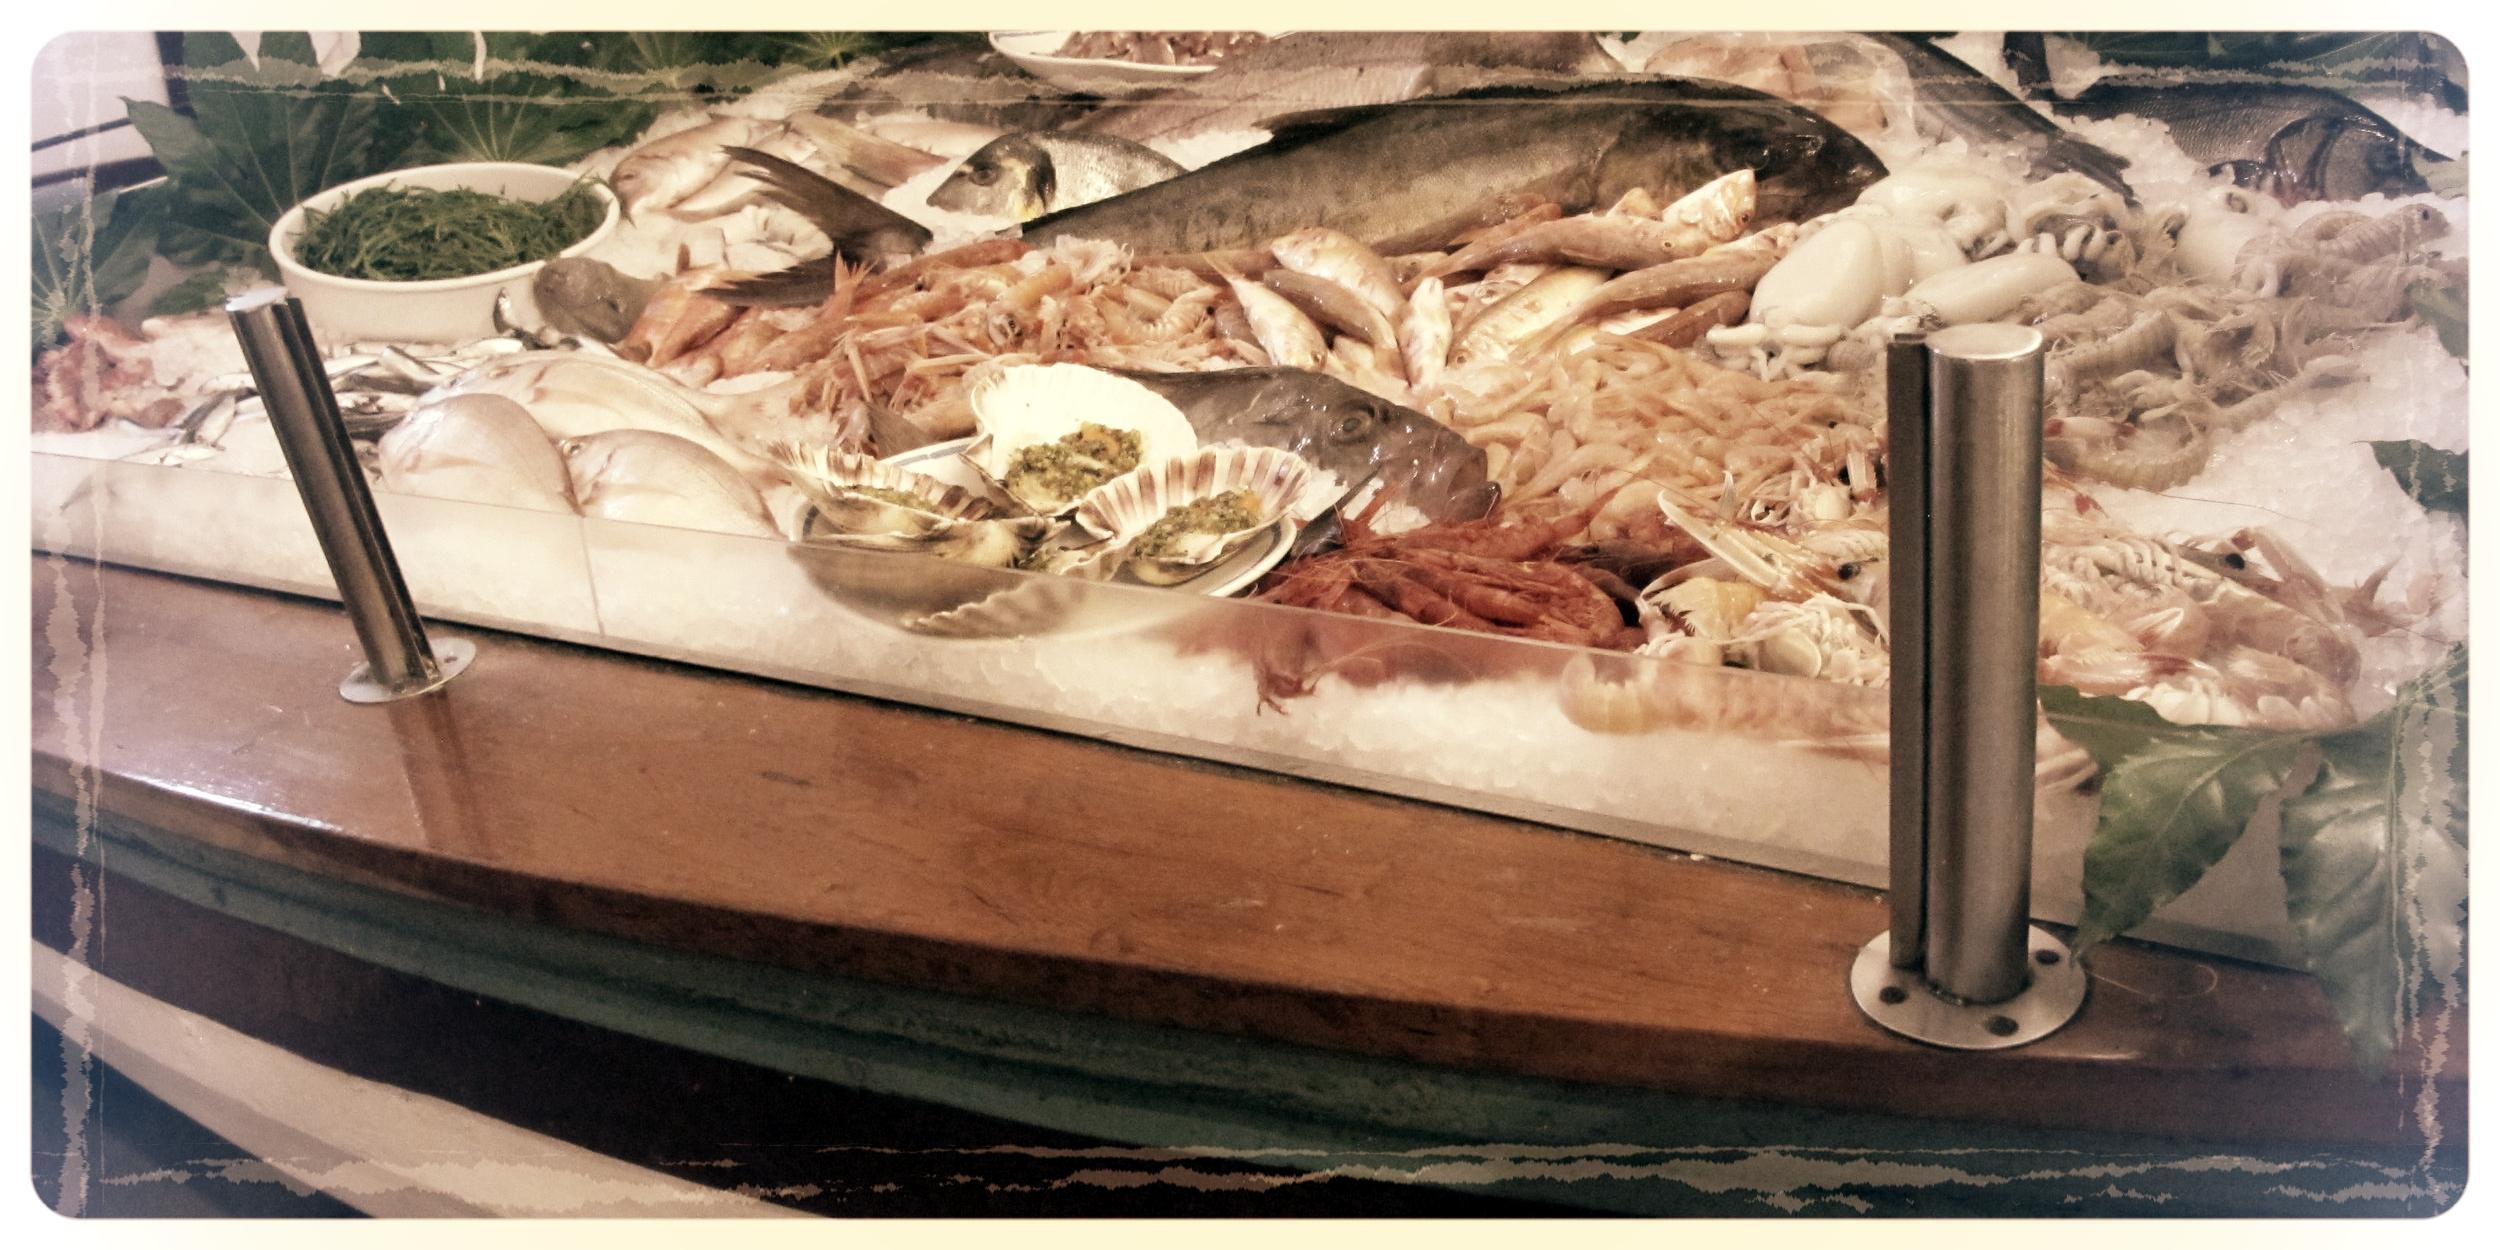 Boat-CatchOfTheDay-Display-PescatoreMilano.JPG